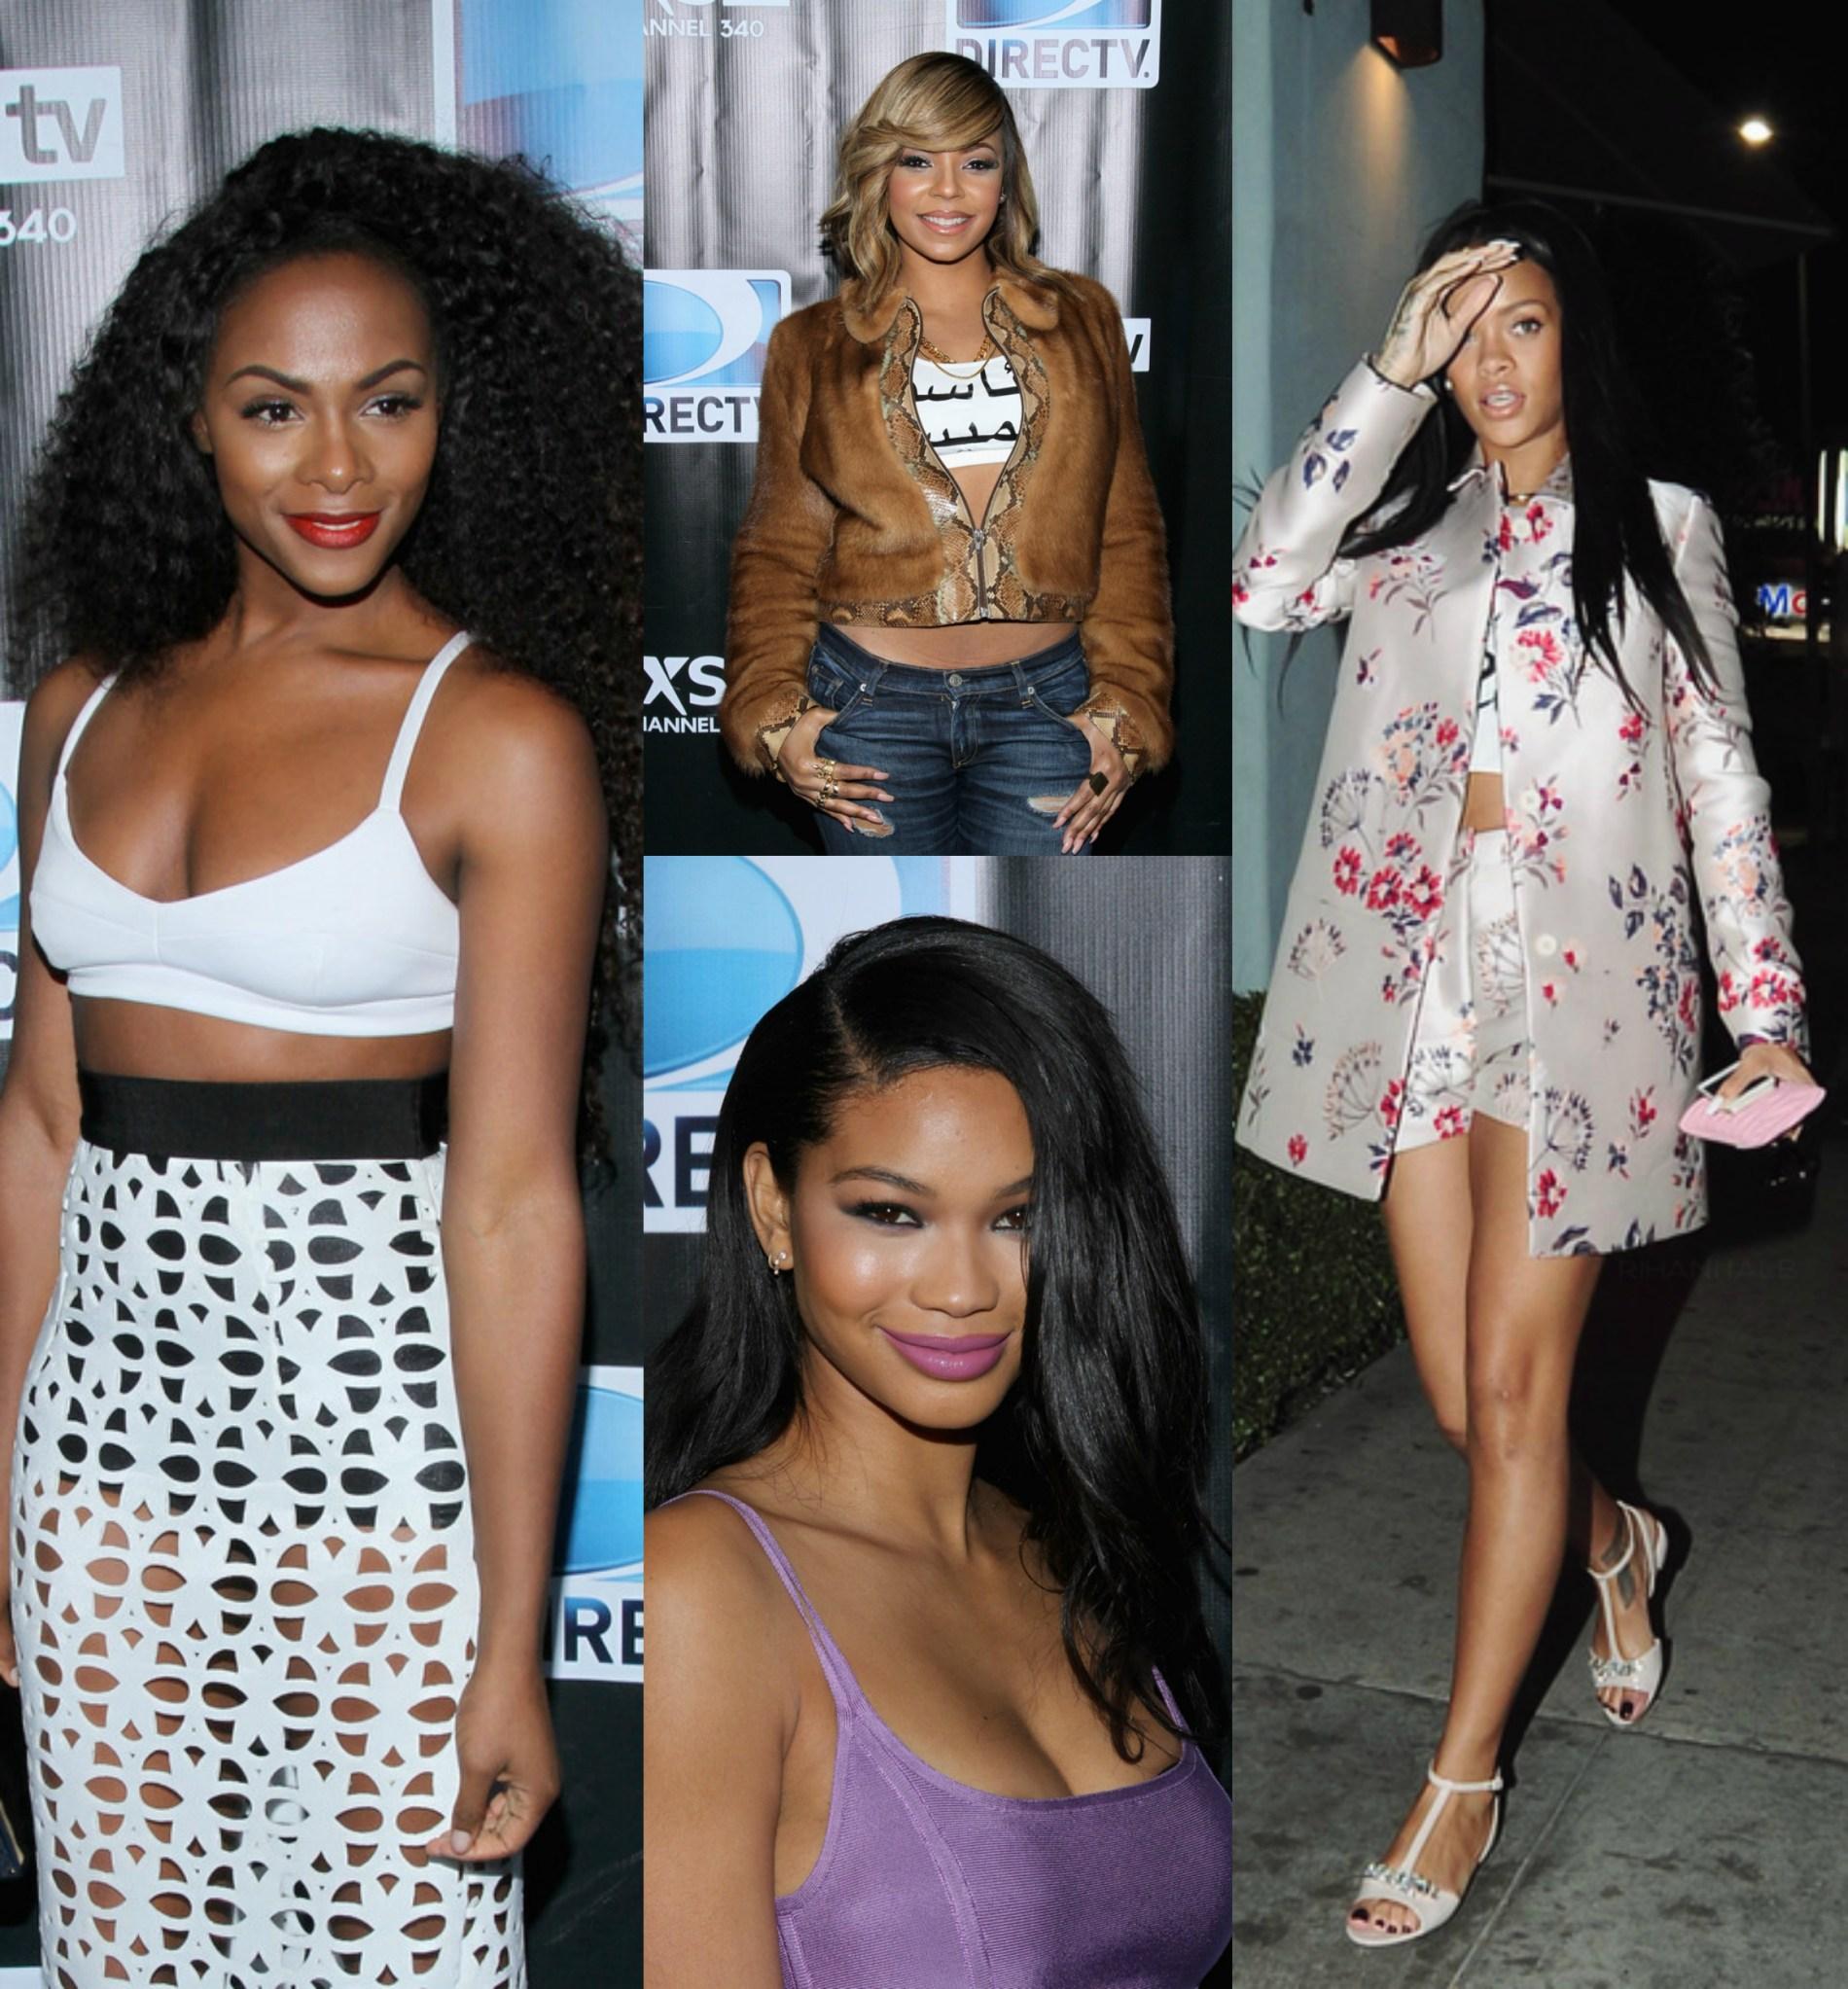 Sizzling Sightings: Tika Sumpter, Chanel Iman, Serena Williams, Rihanna, Chrissy Teigen and More!